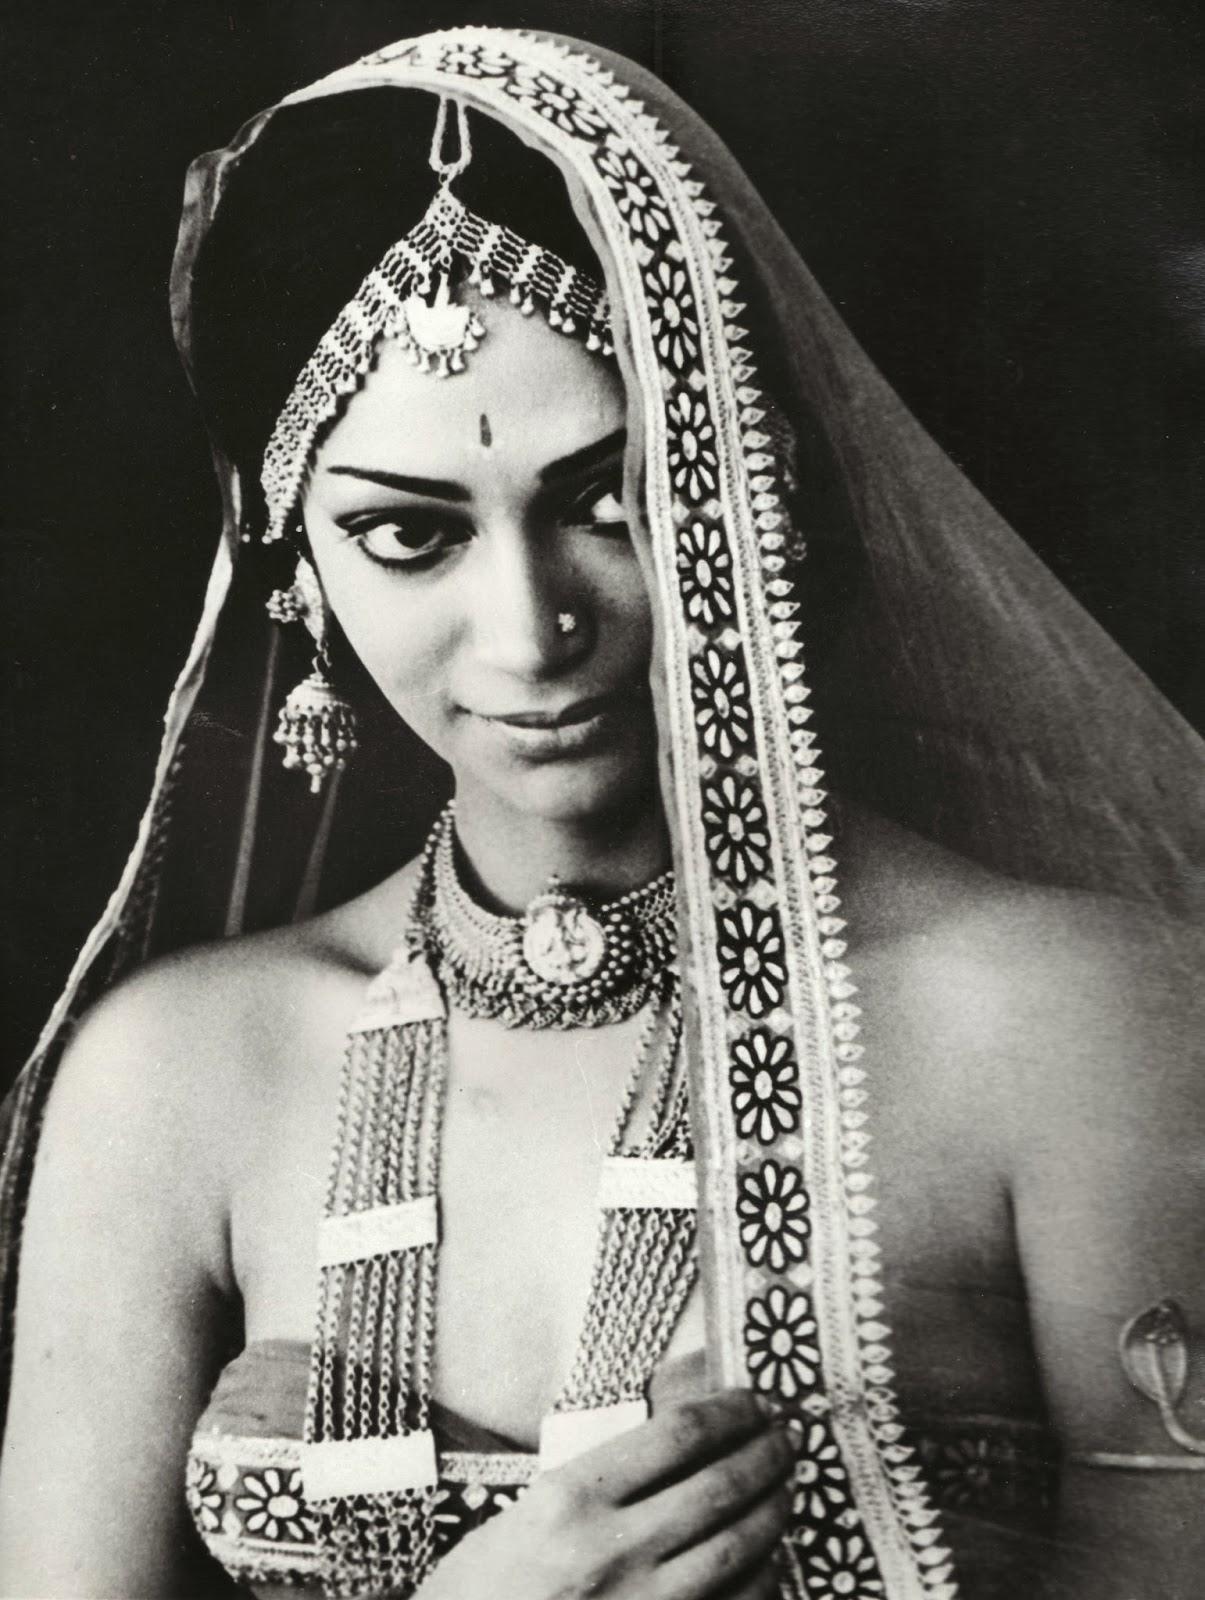 Simi Garewal Nude Pics